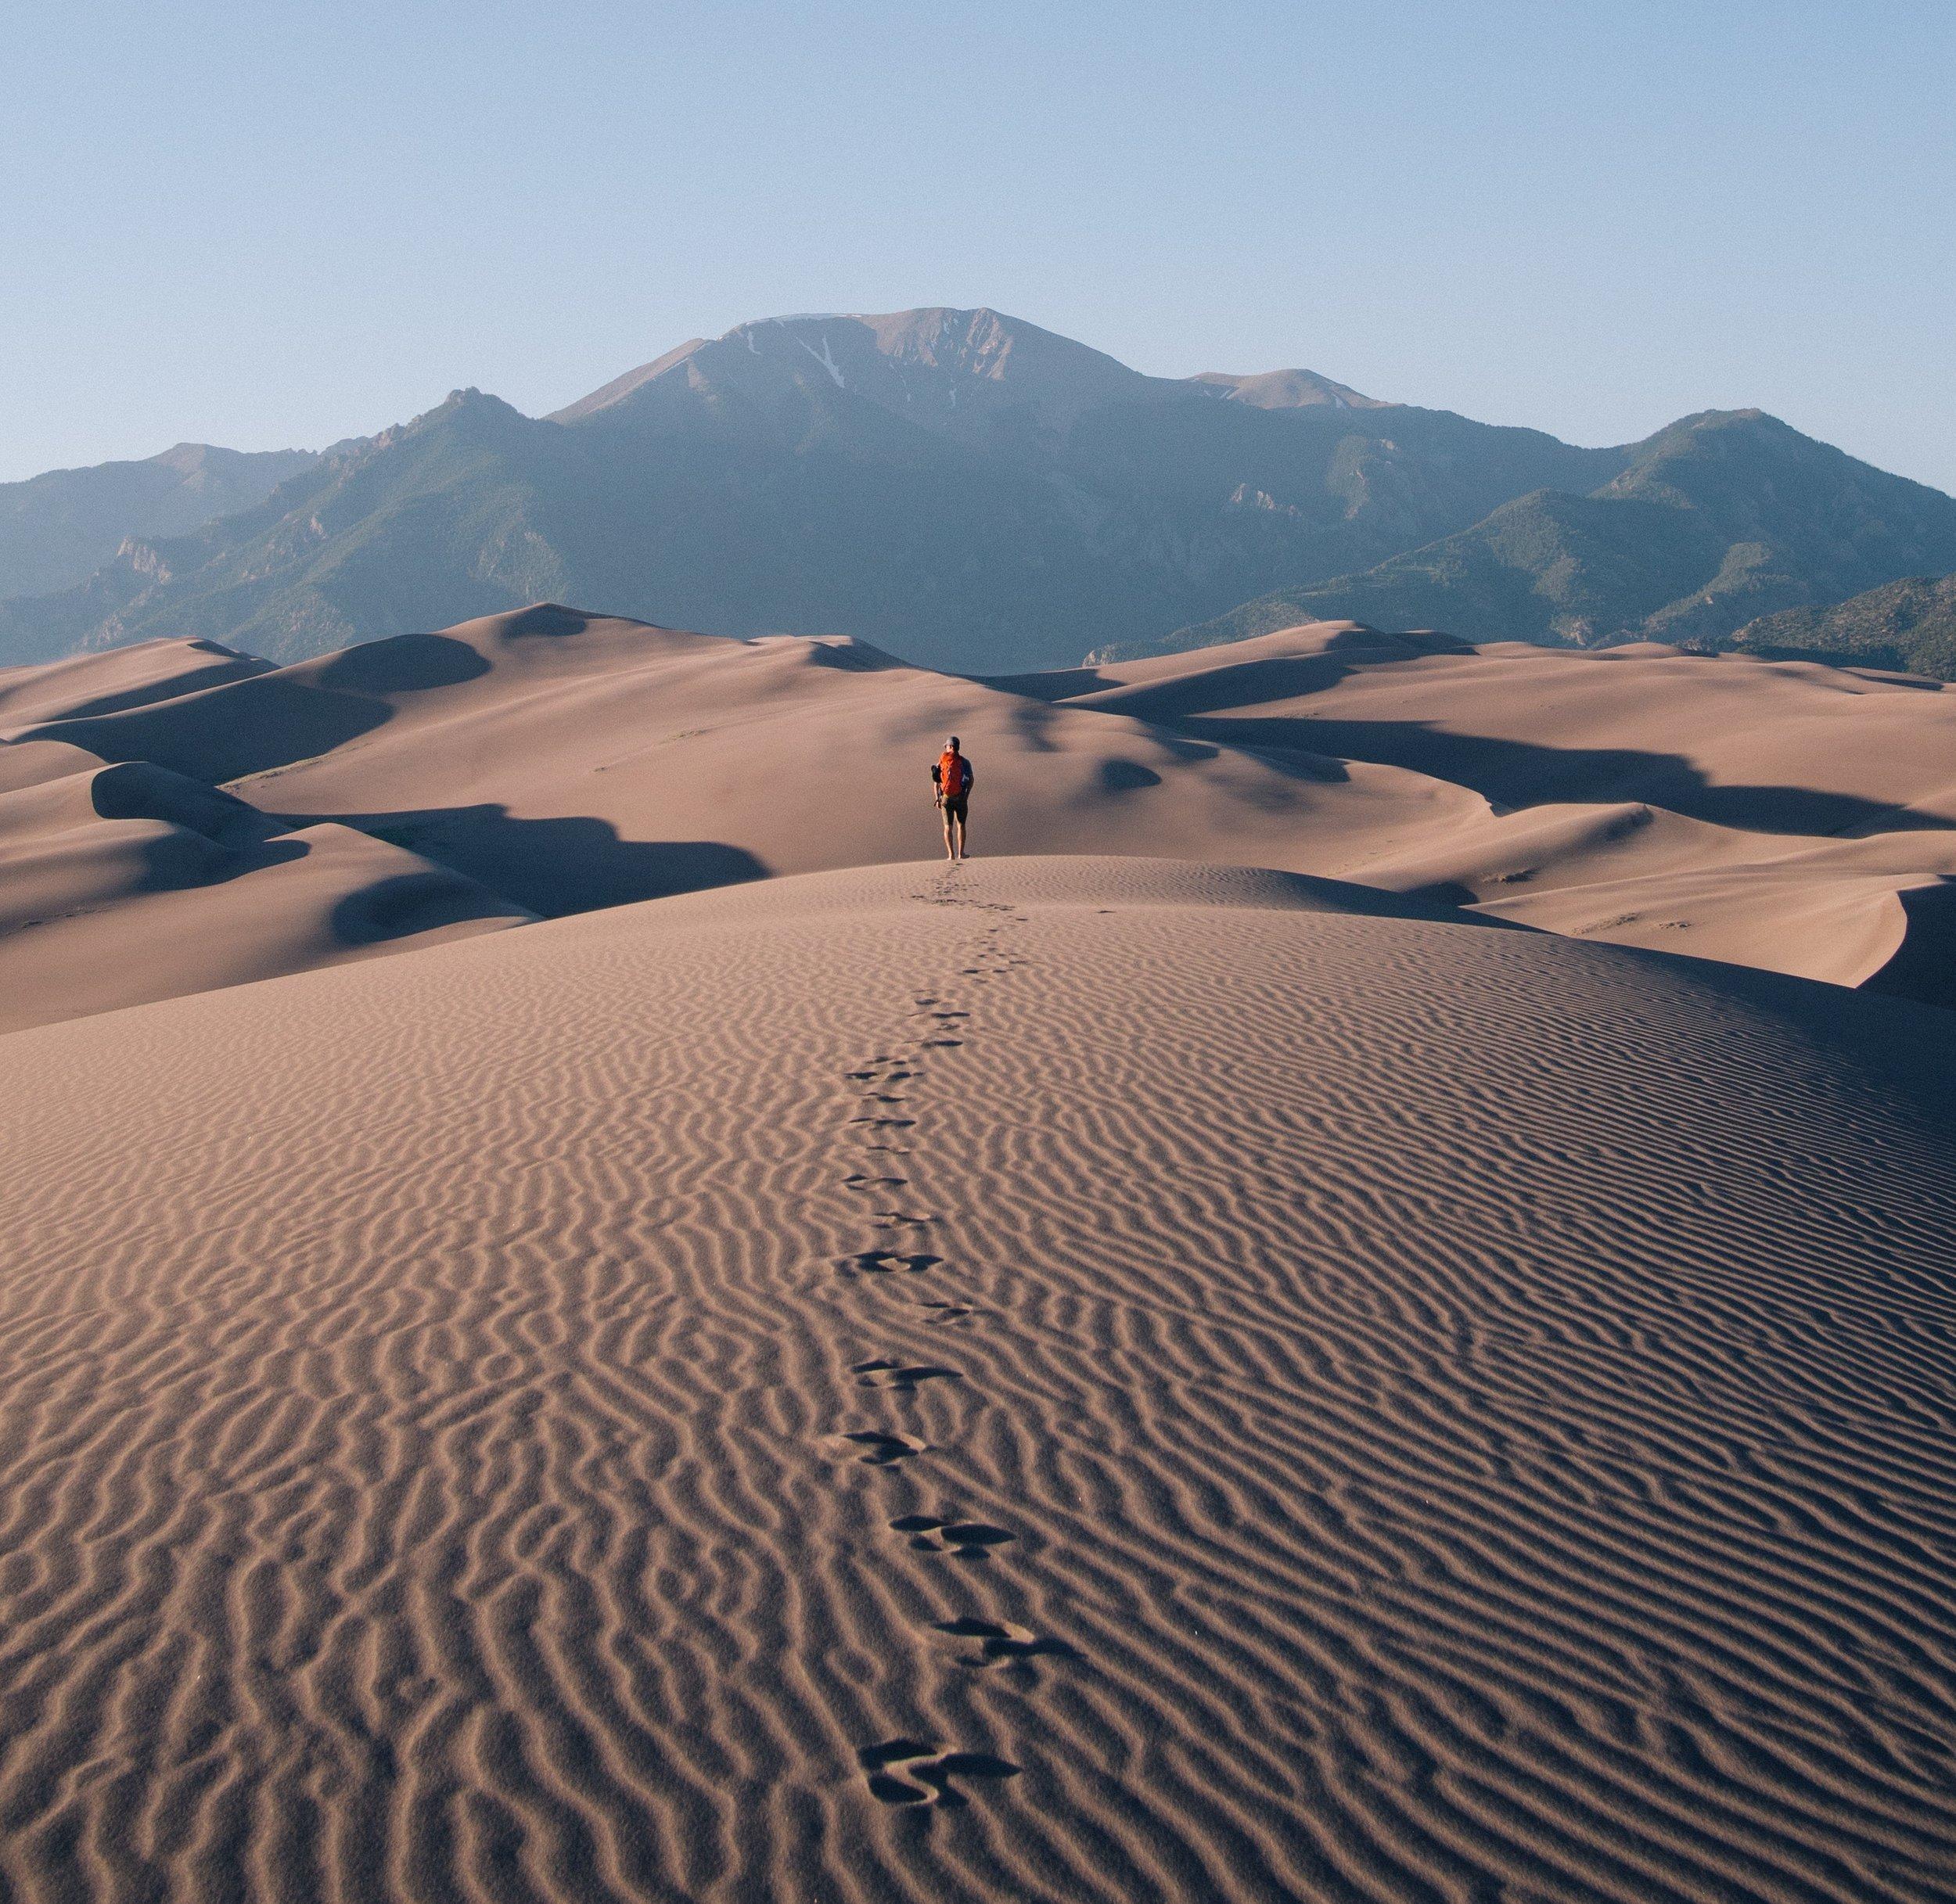 man walks on desert towards mountains leaving footprints in the sand.jpg